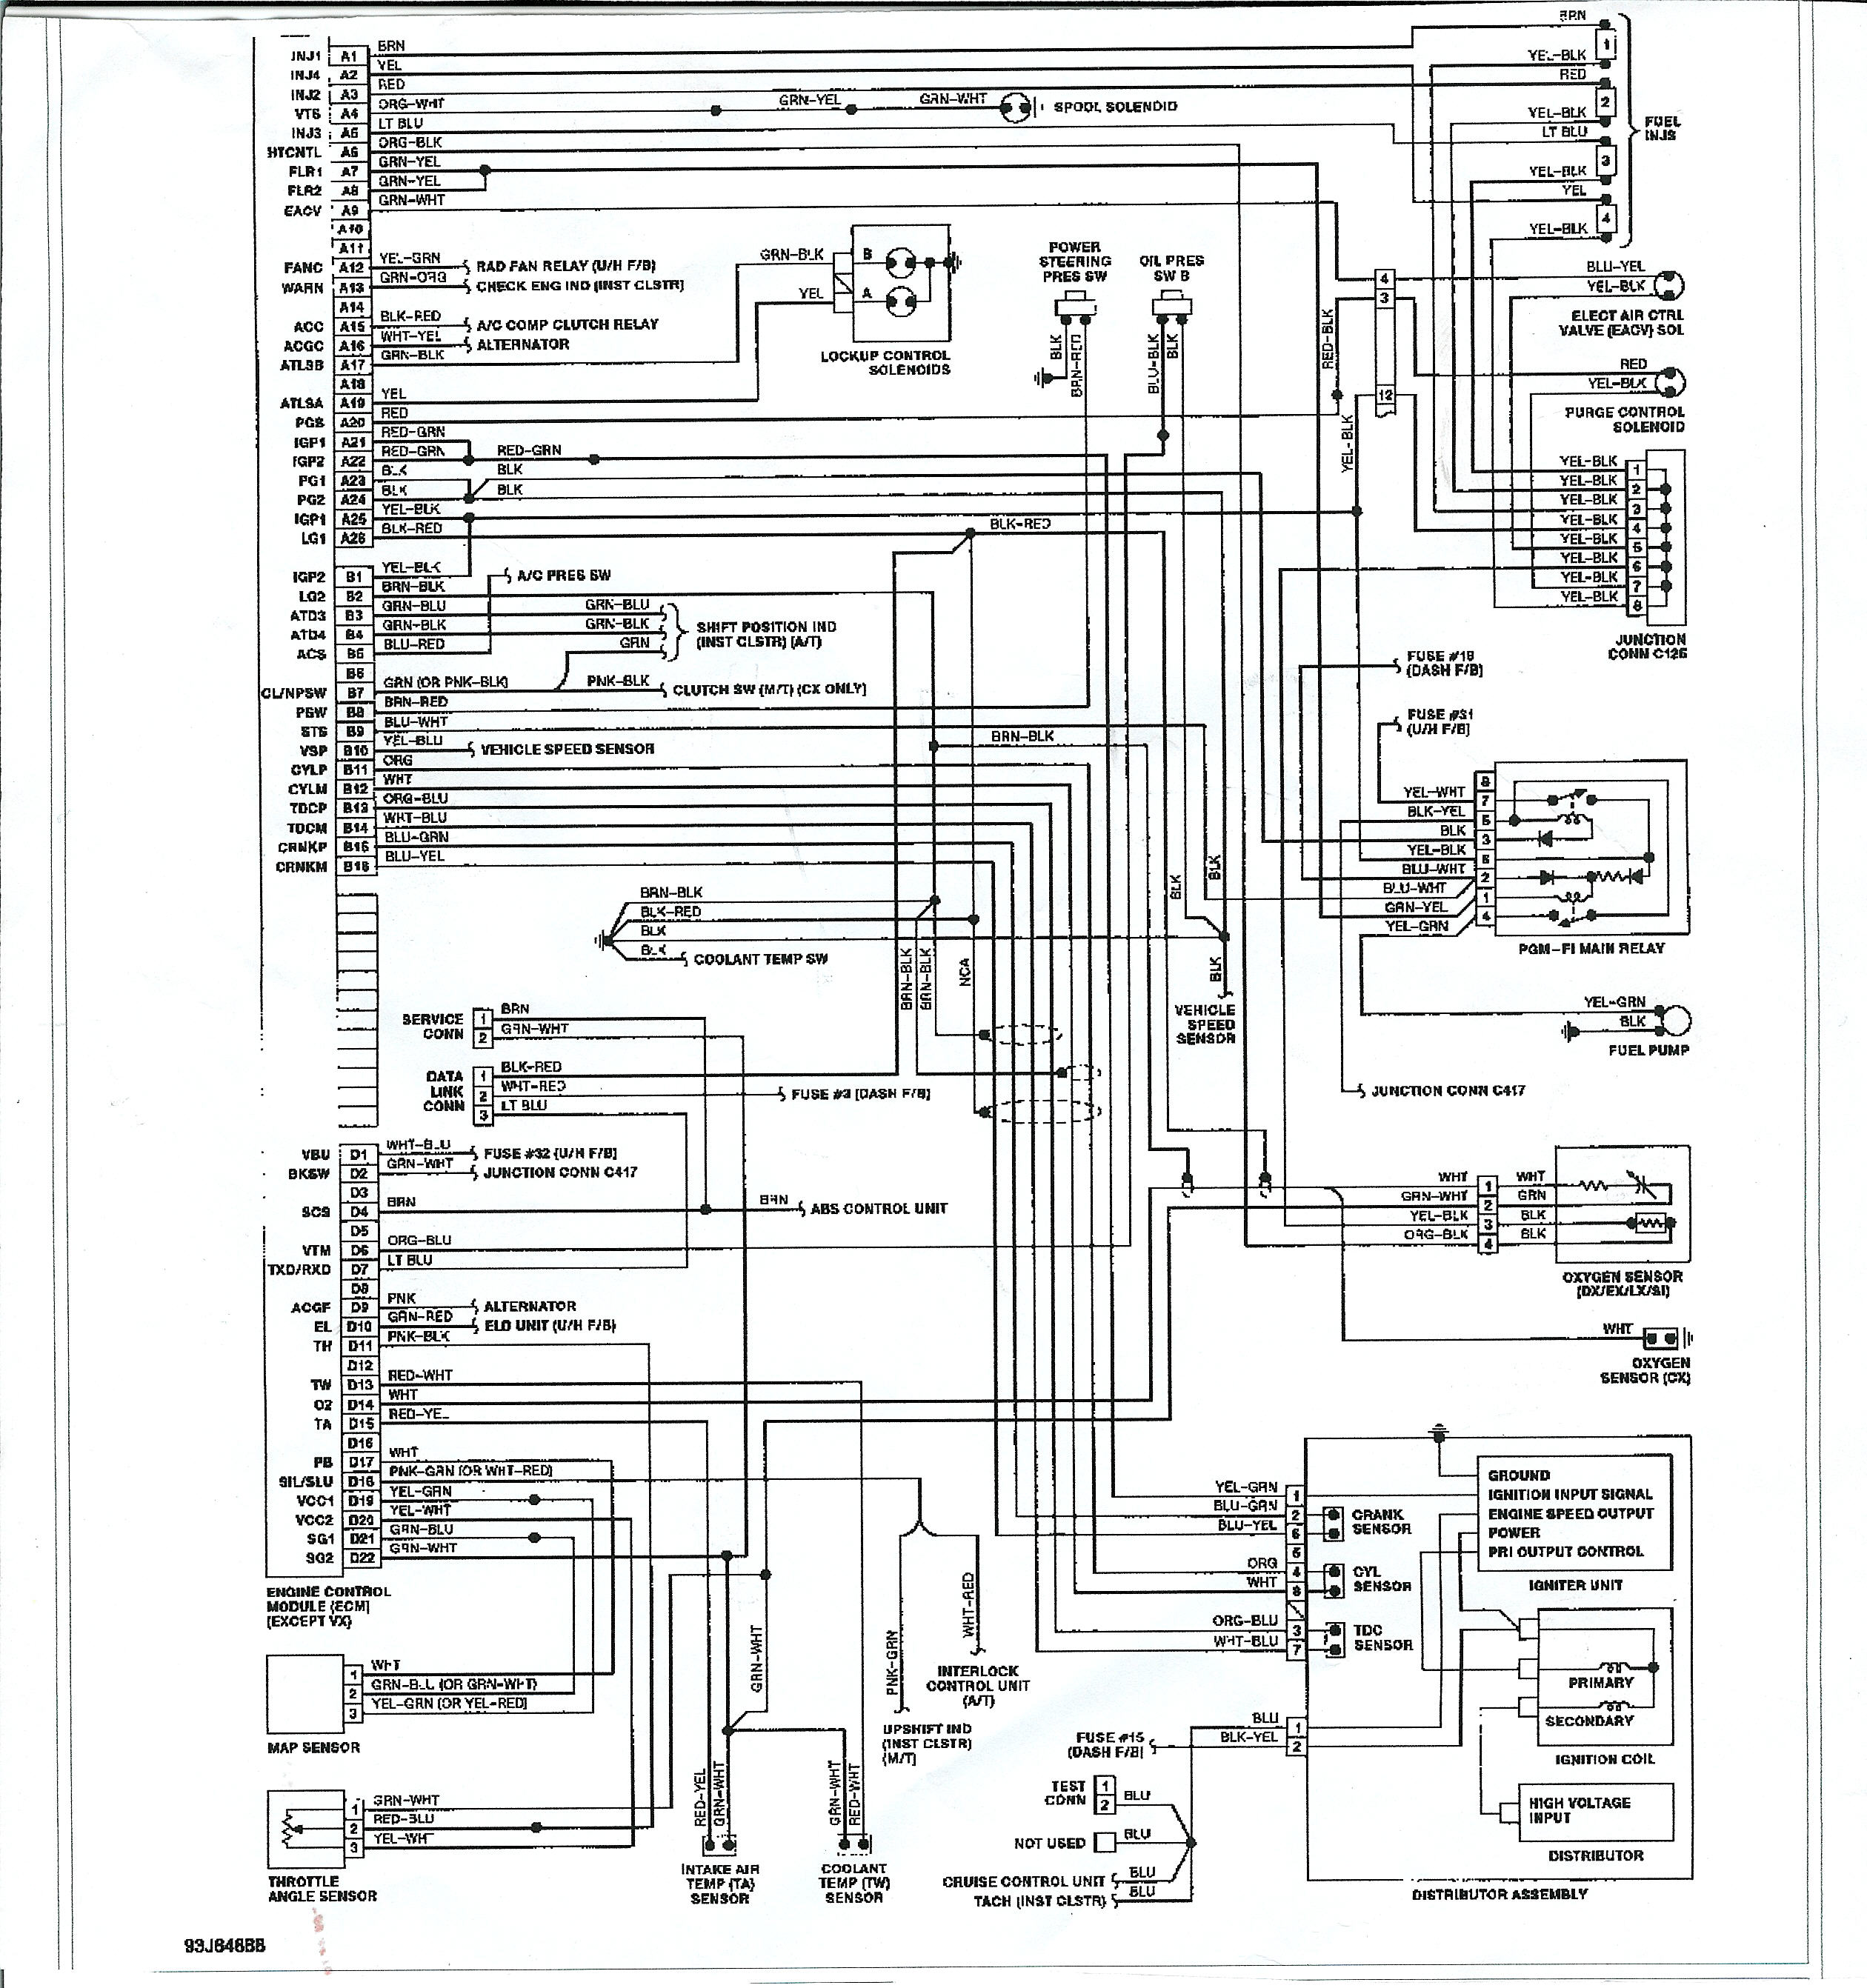 honda civic ecu wiring wiring diagram data schema01 civic wiring diagram wiring library 2004 honda civic ecu wiring diagram 2001 honda civic ecu